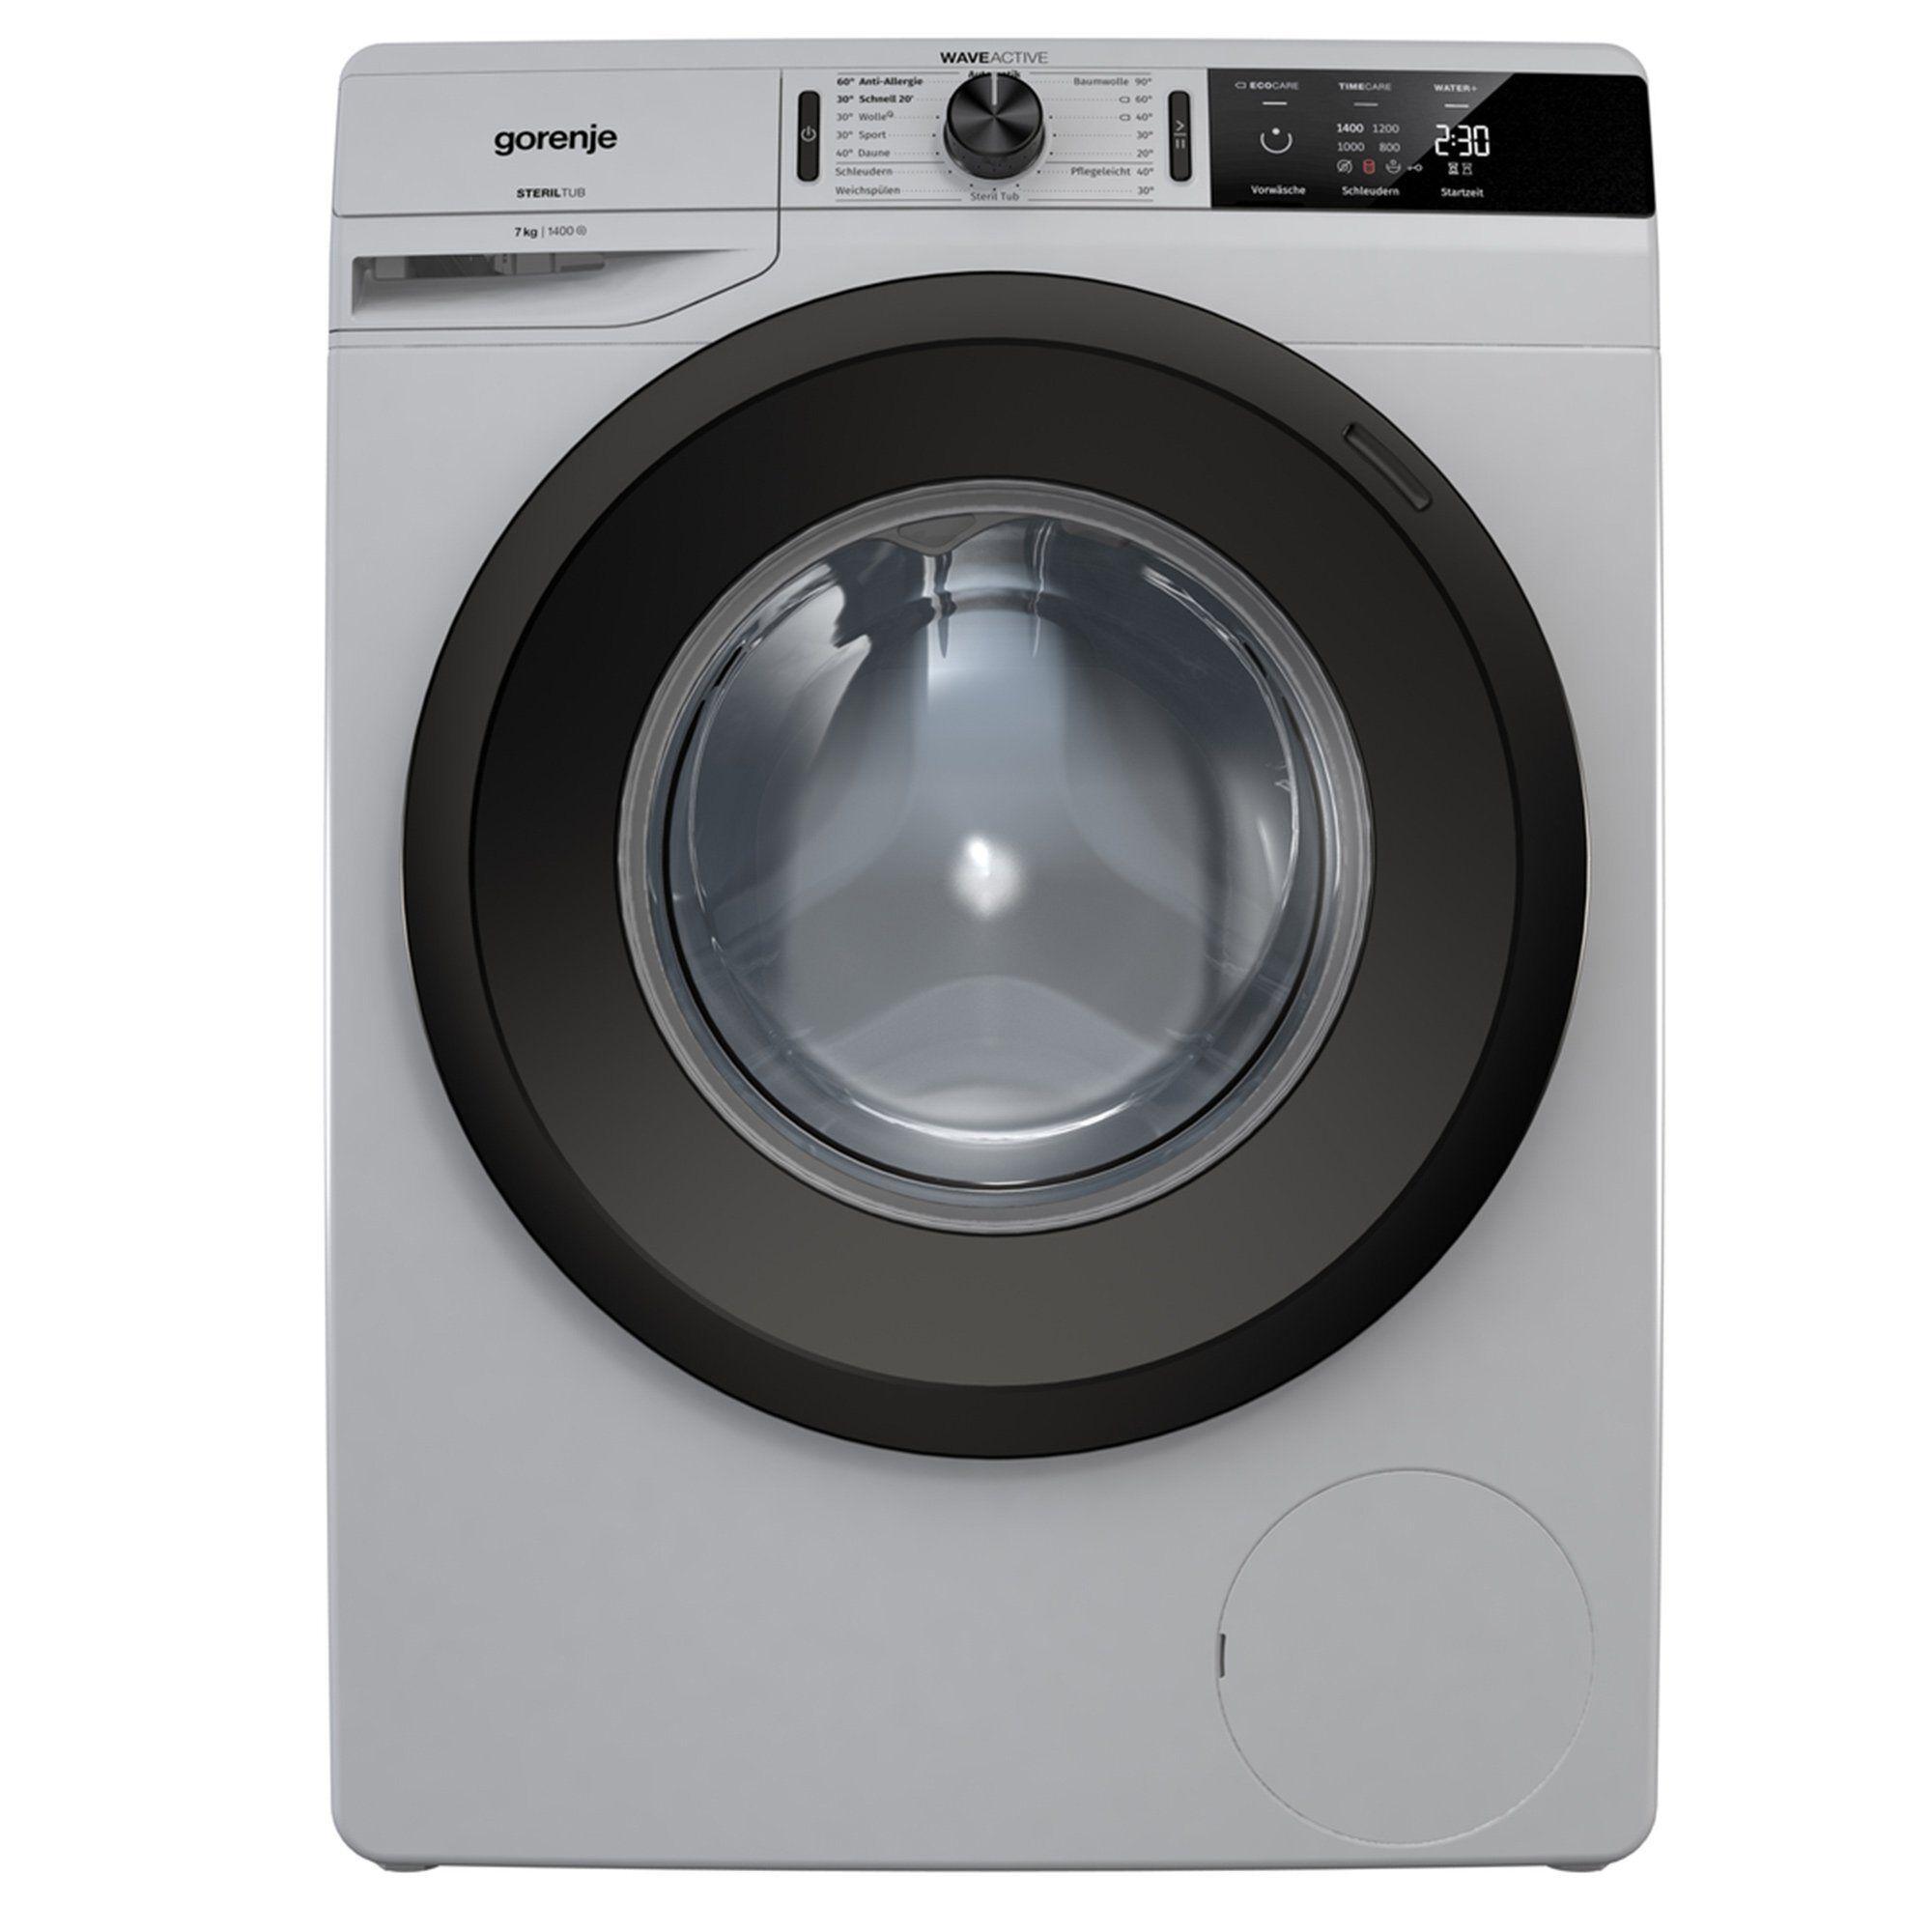 Gorenje Waschmaschine WE 74S3 PA A+++, 7 kg, 1400 U/Min, grau metallic AquaStop, Energieeffizienzklasse A+++